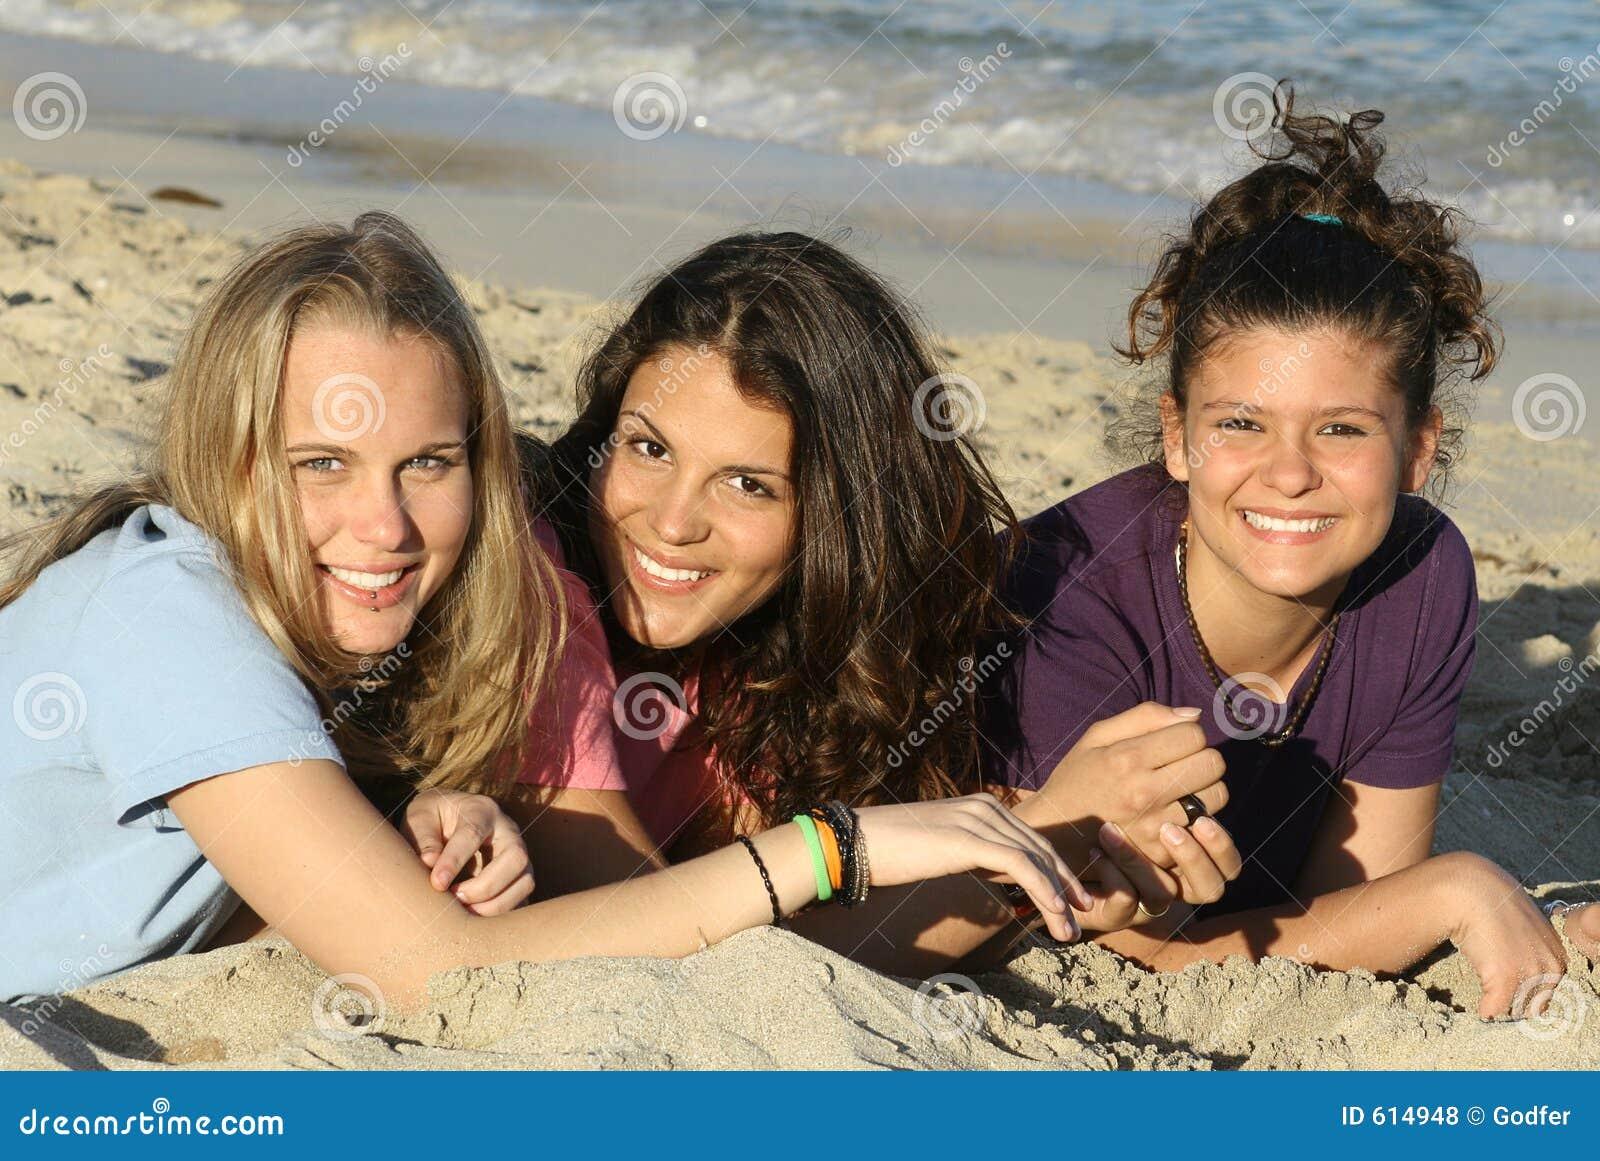 Teen Summertime Dreams 6